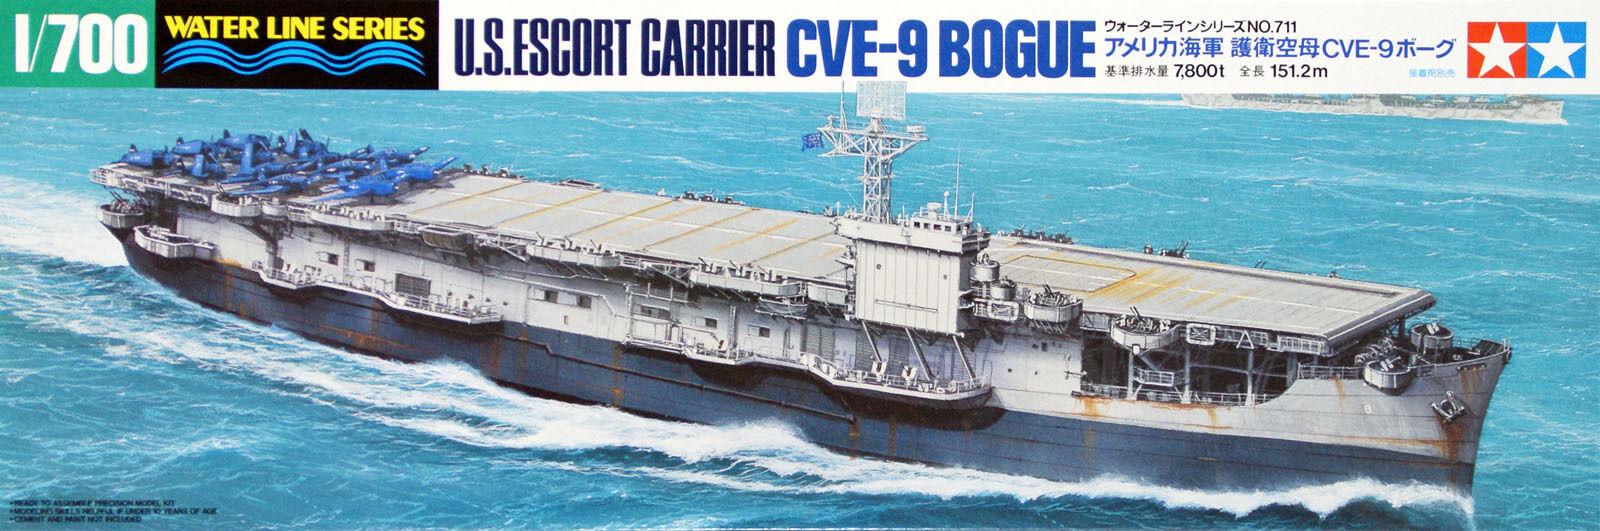 Plastic Models - Hasegawa - 711 - Aircraft Carrier Bogue